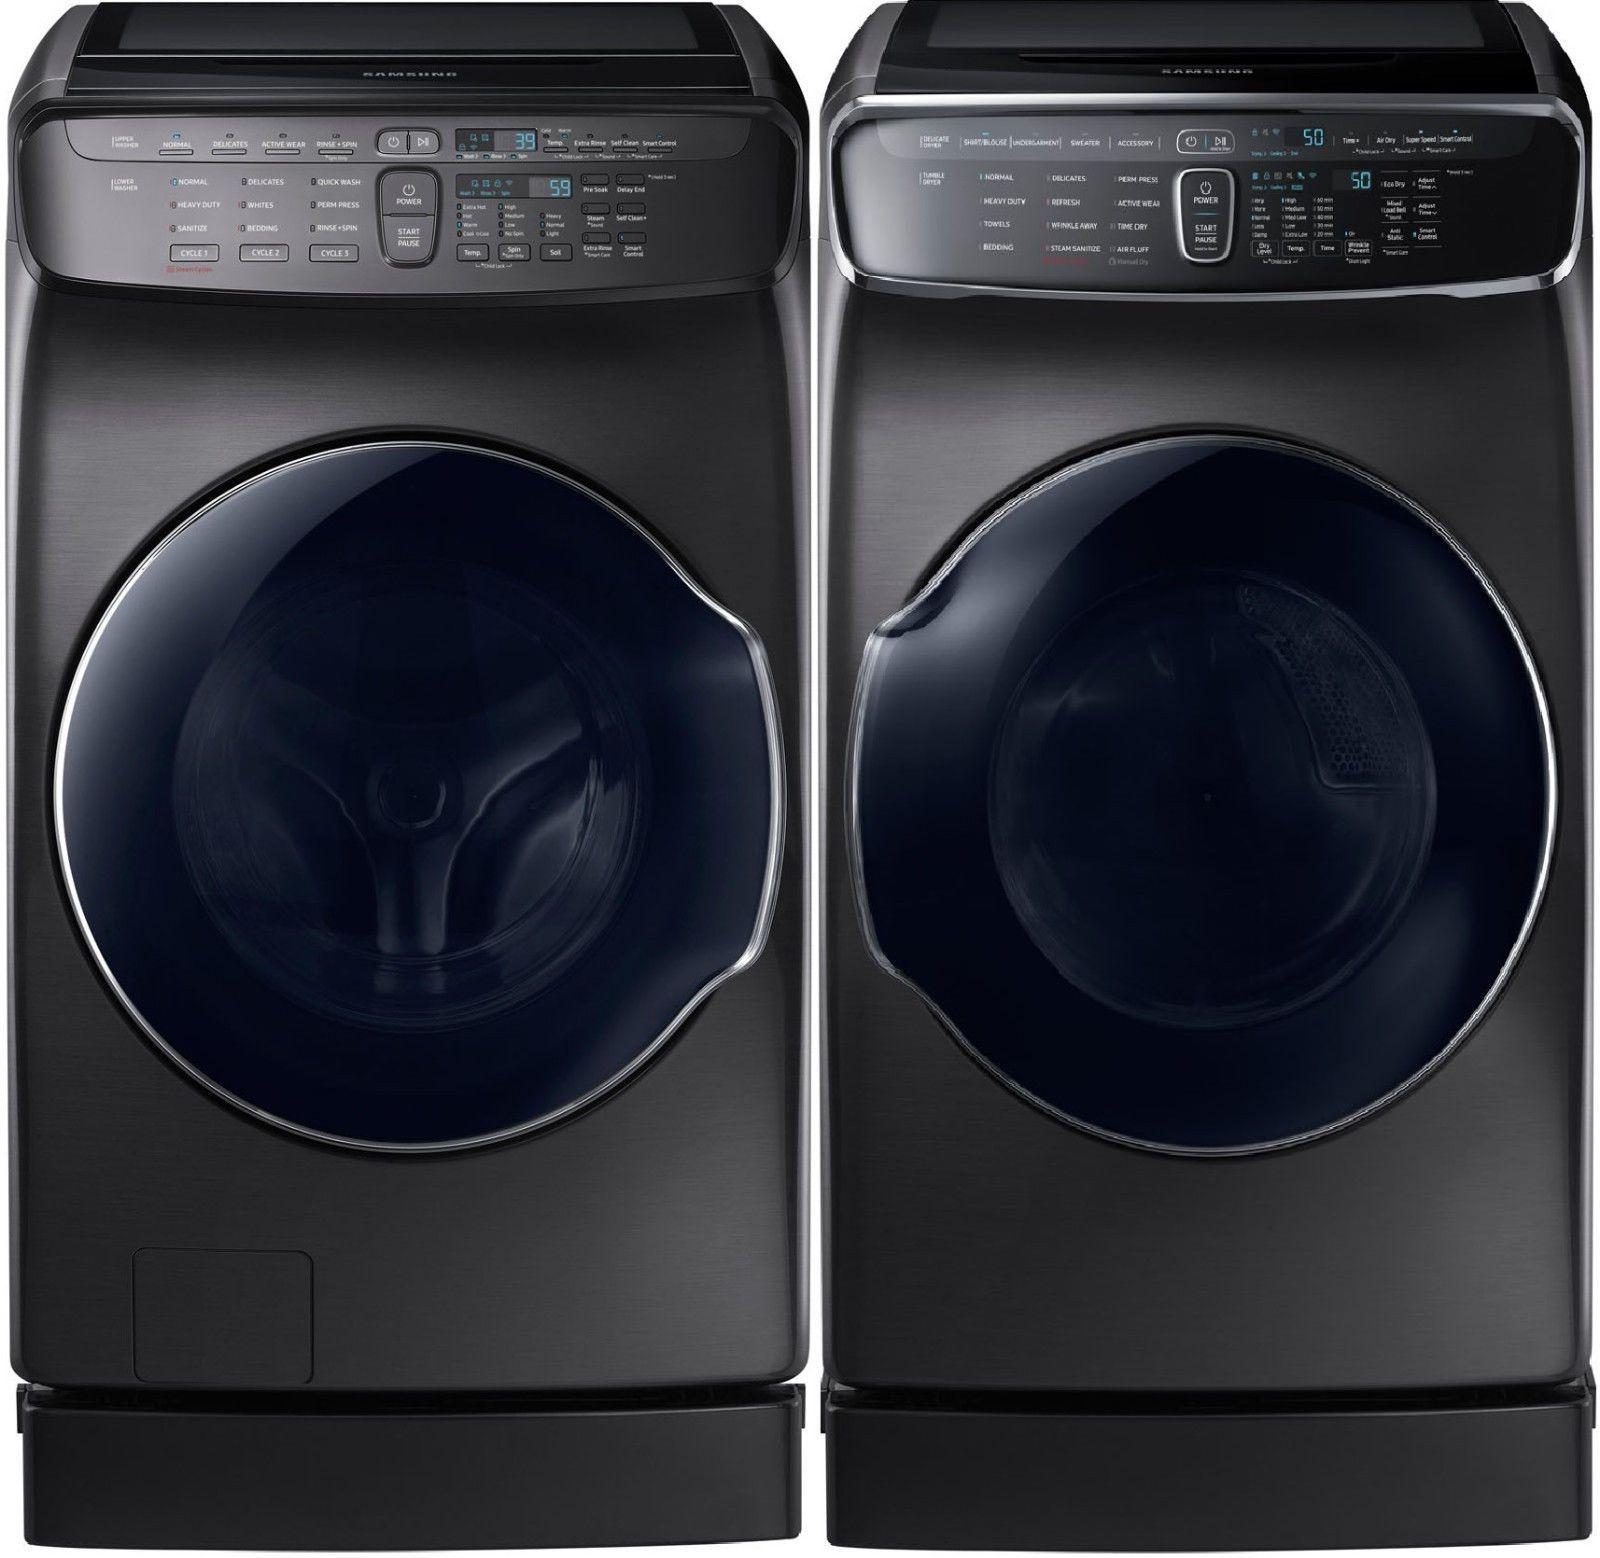 Samsung Black Stainless Flex Washer Electric Dryer Peds Wv60m9900av Dve60m9900v Ebay Buy Washer And Dryer Washer And Dryer Stackable Washer And Dryer